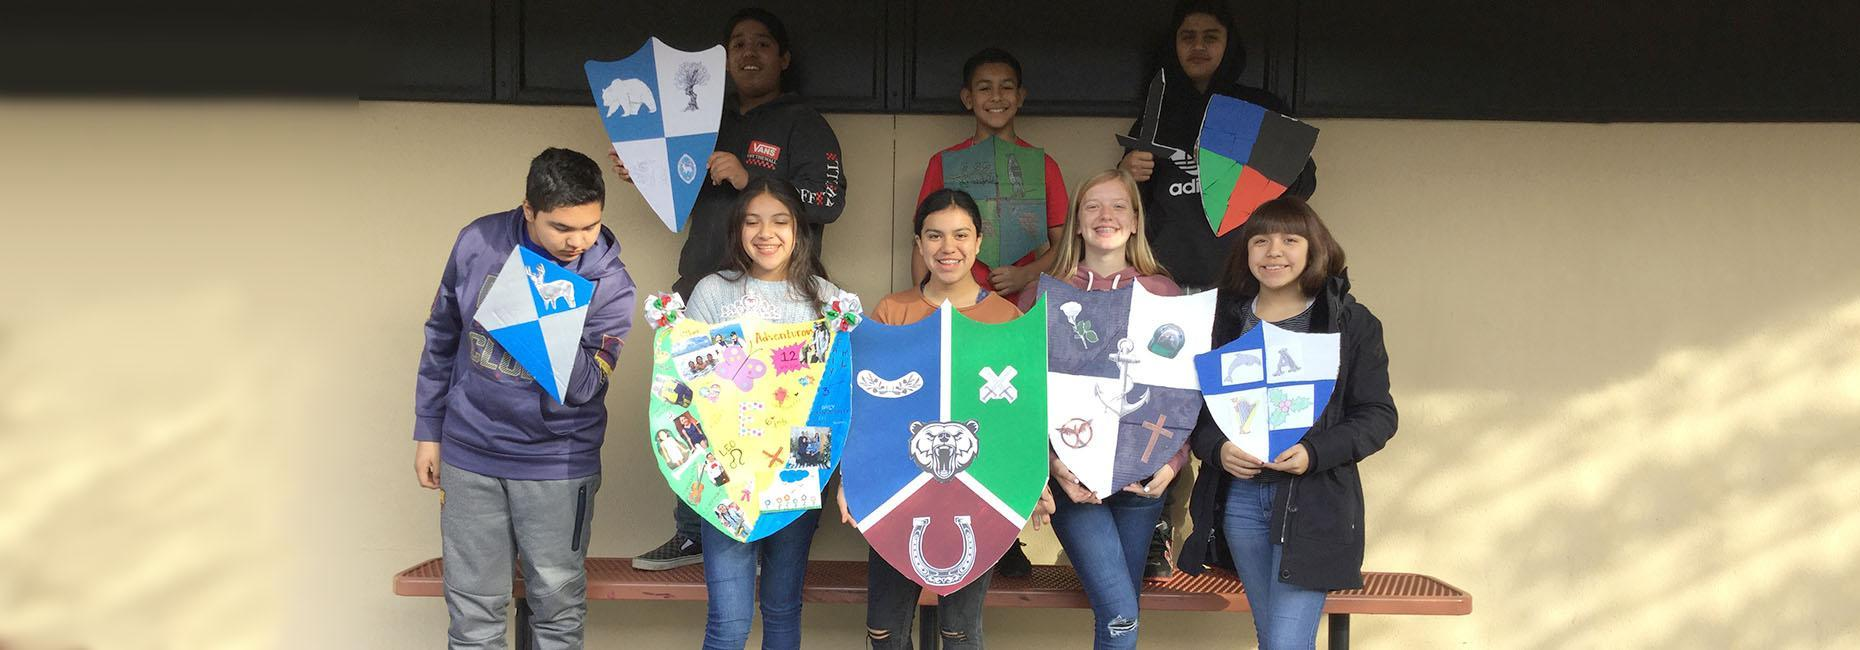 Seventh grade shields